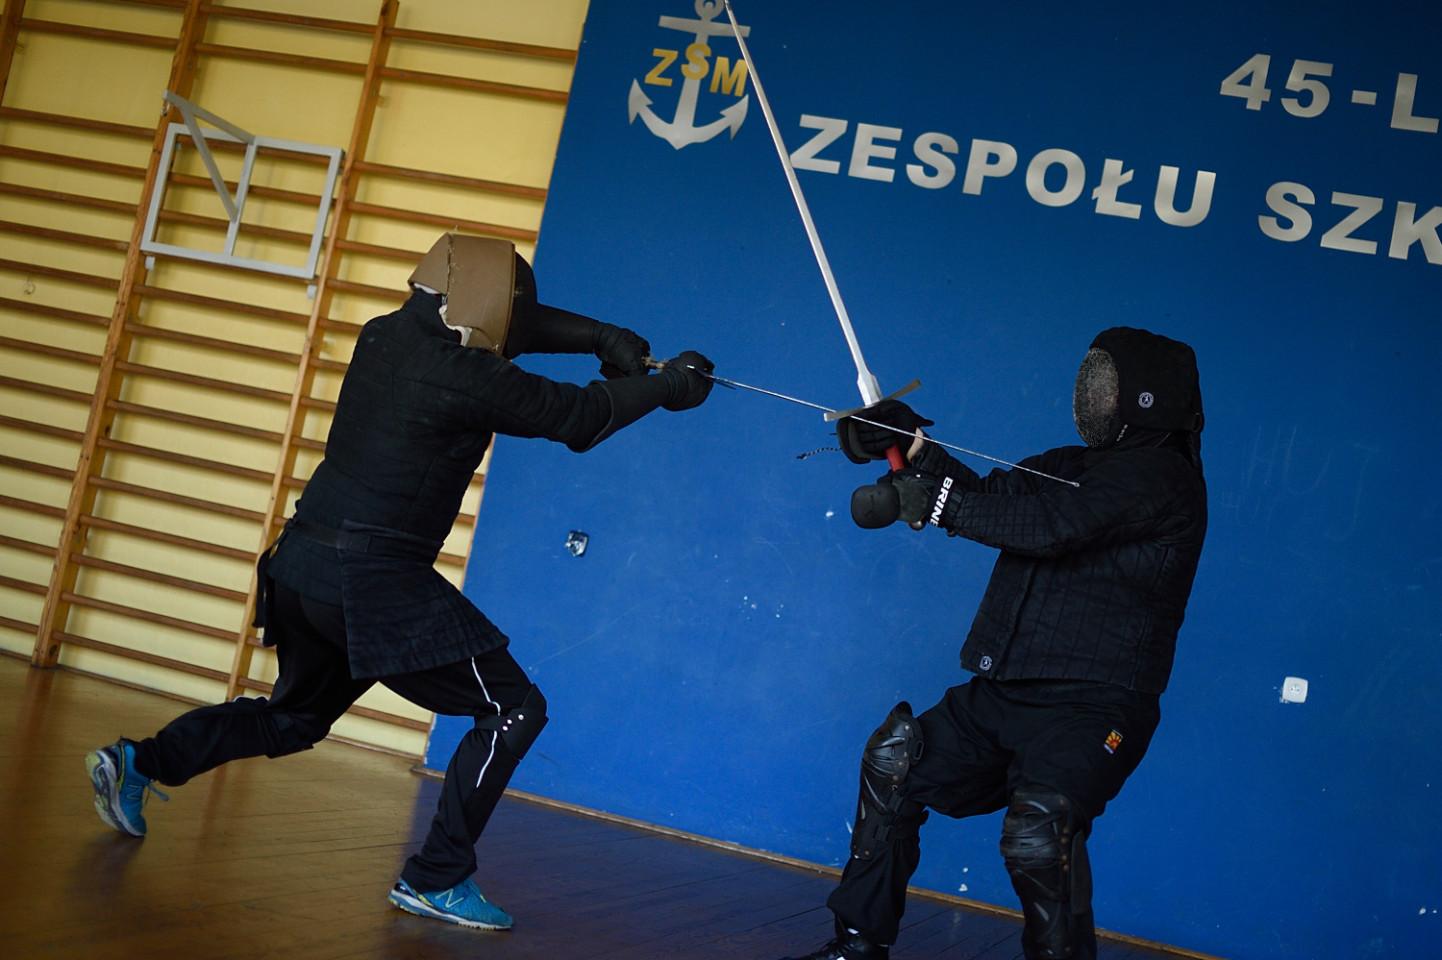 Trening walki grupy Rebellium